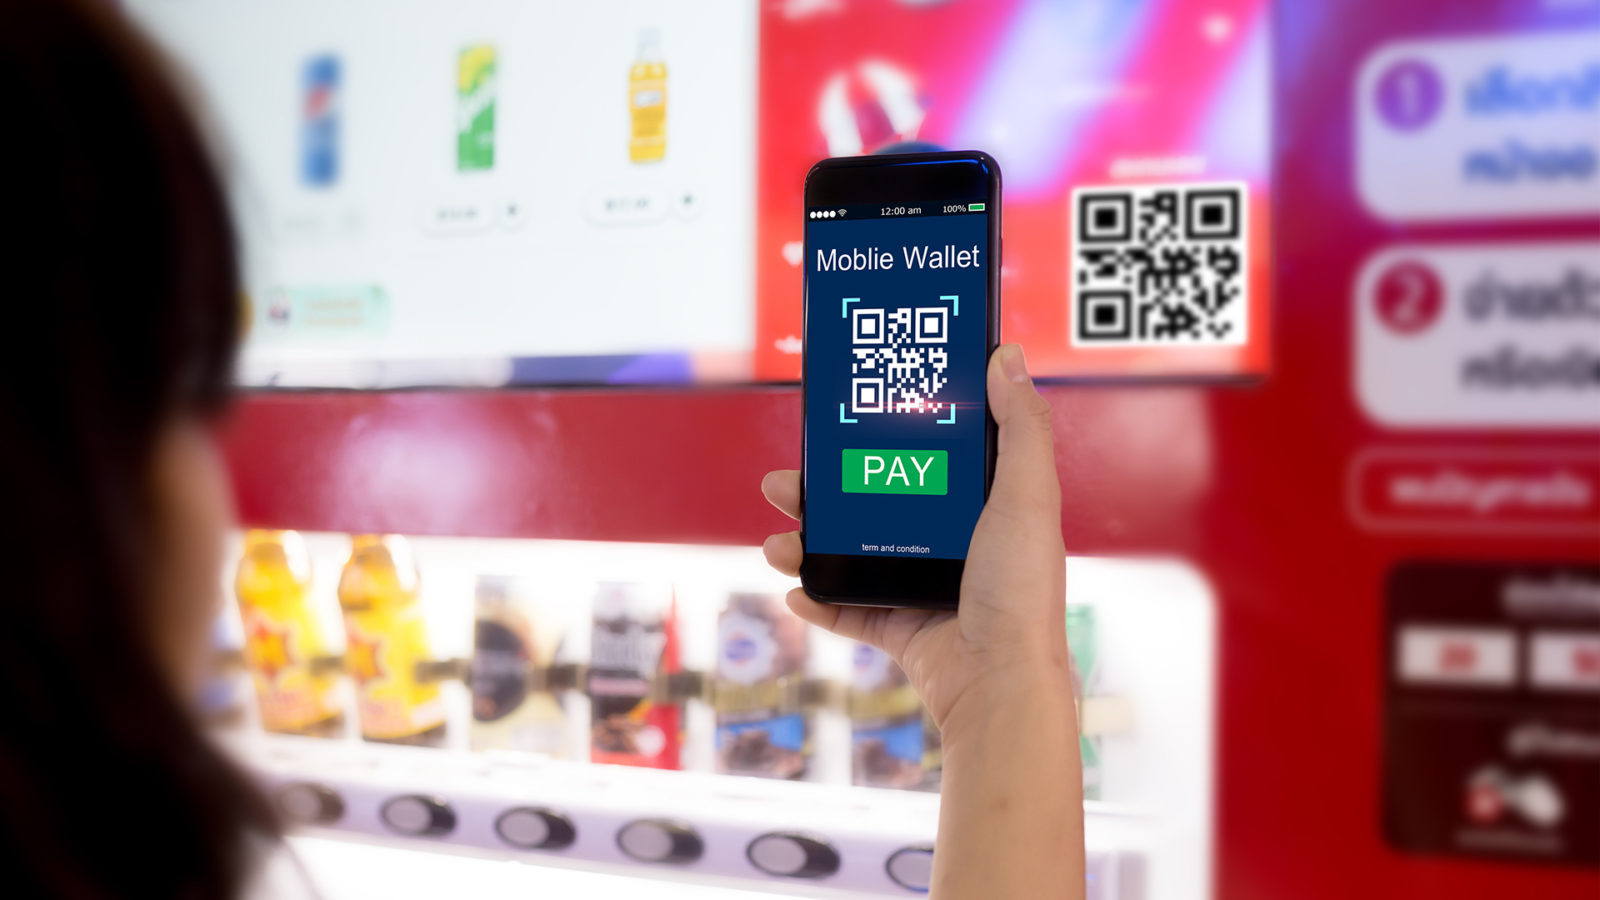 Consider smart vending machines